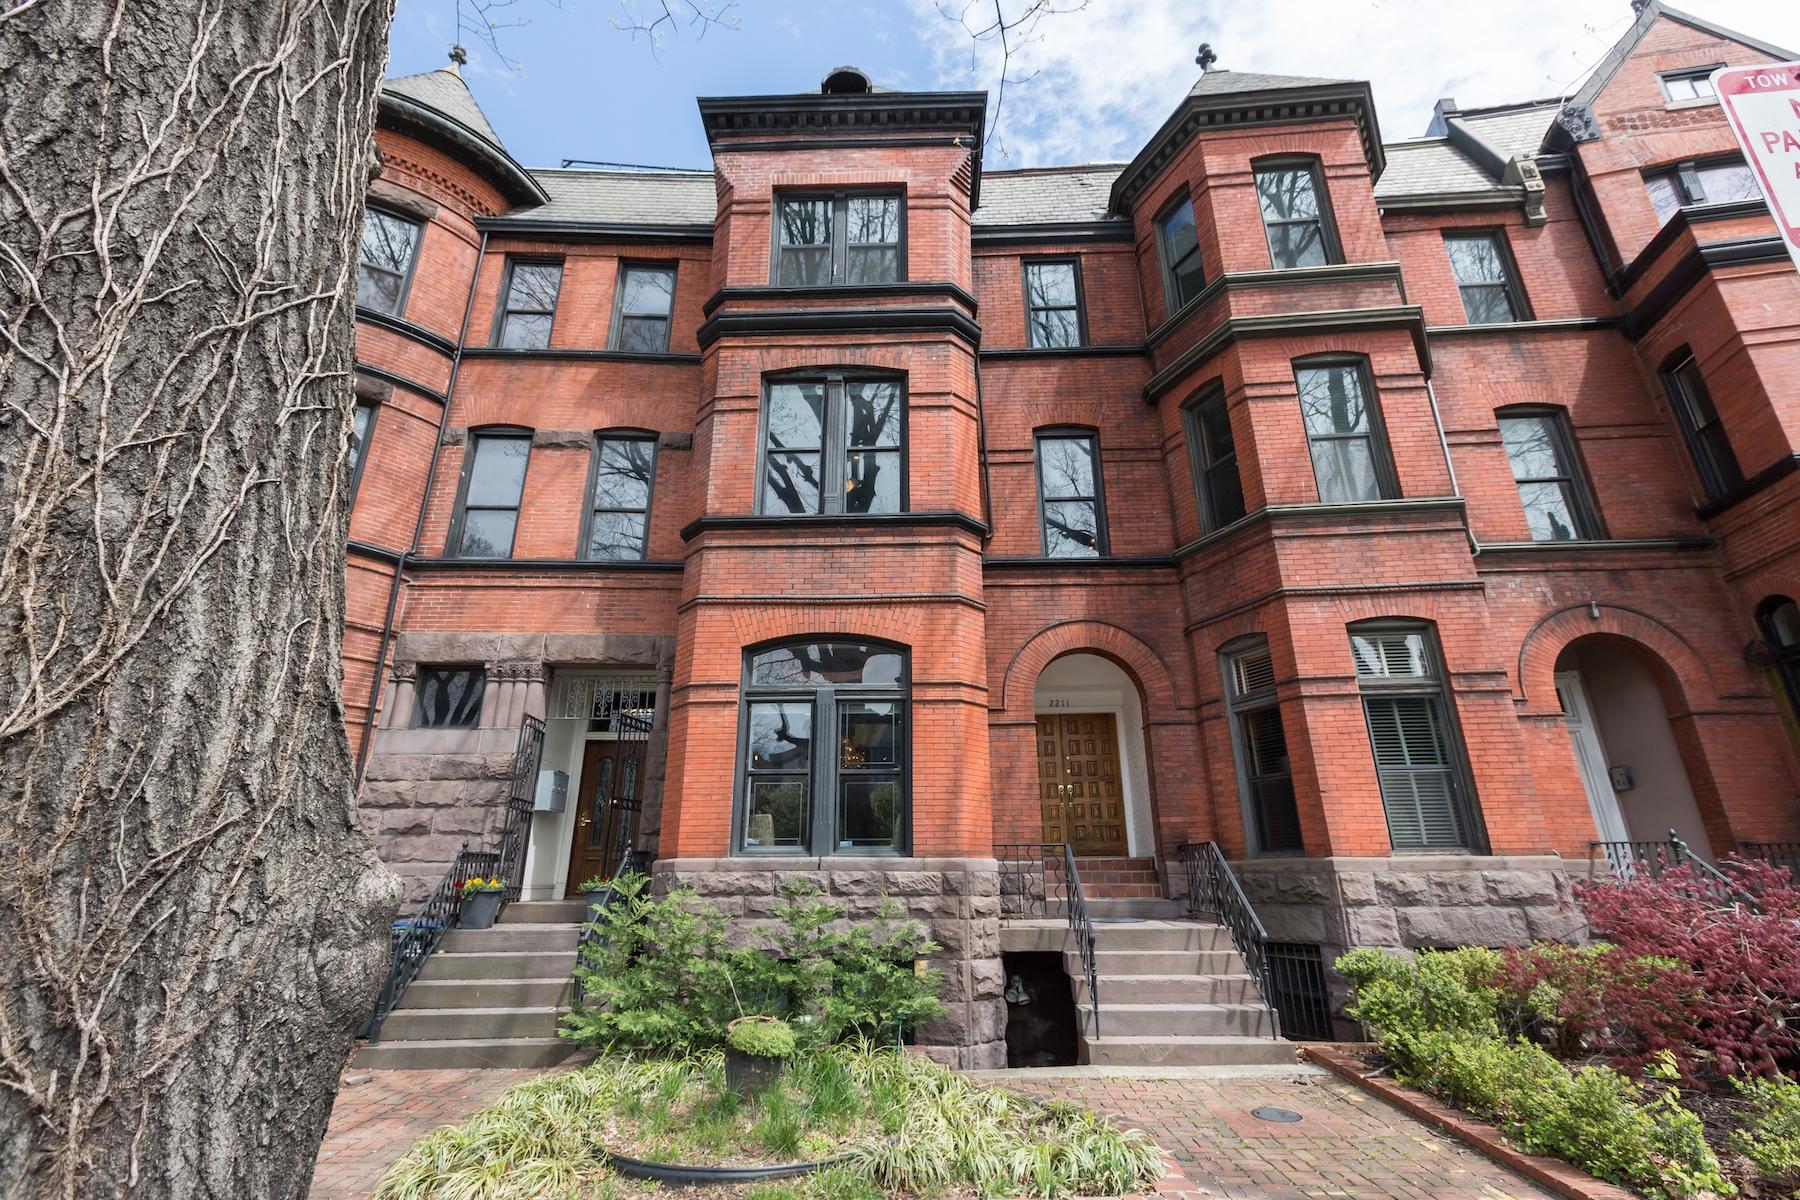 Apartment for Rent at Washington Circle 2211 Washington Circle Nw Washington, District Of Columbia 20037 United States